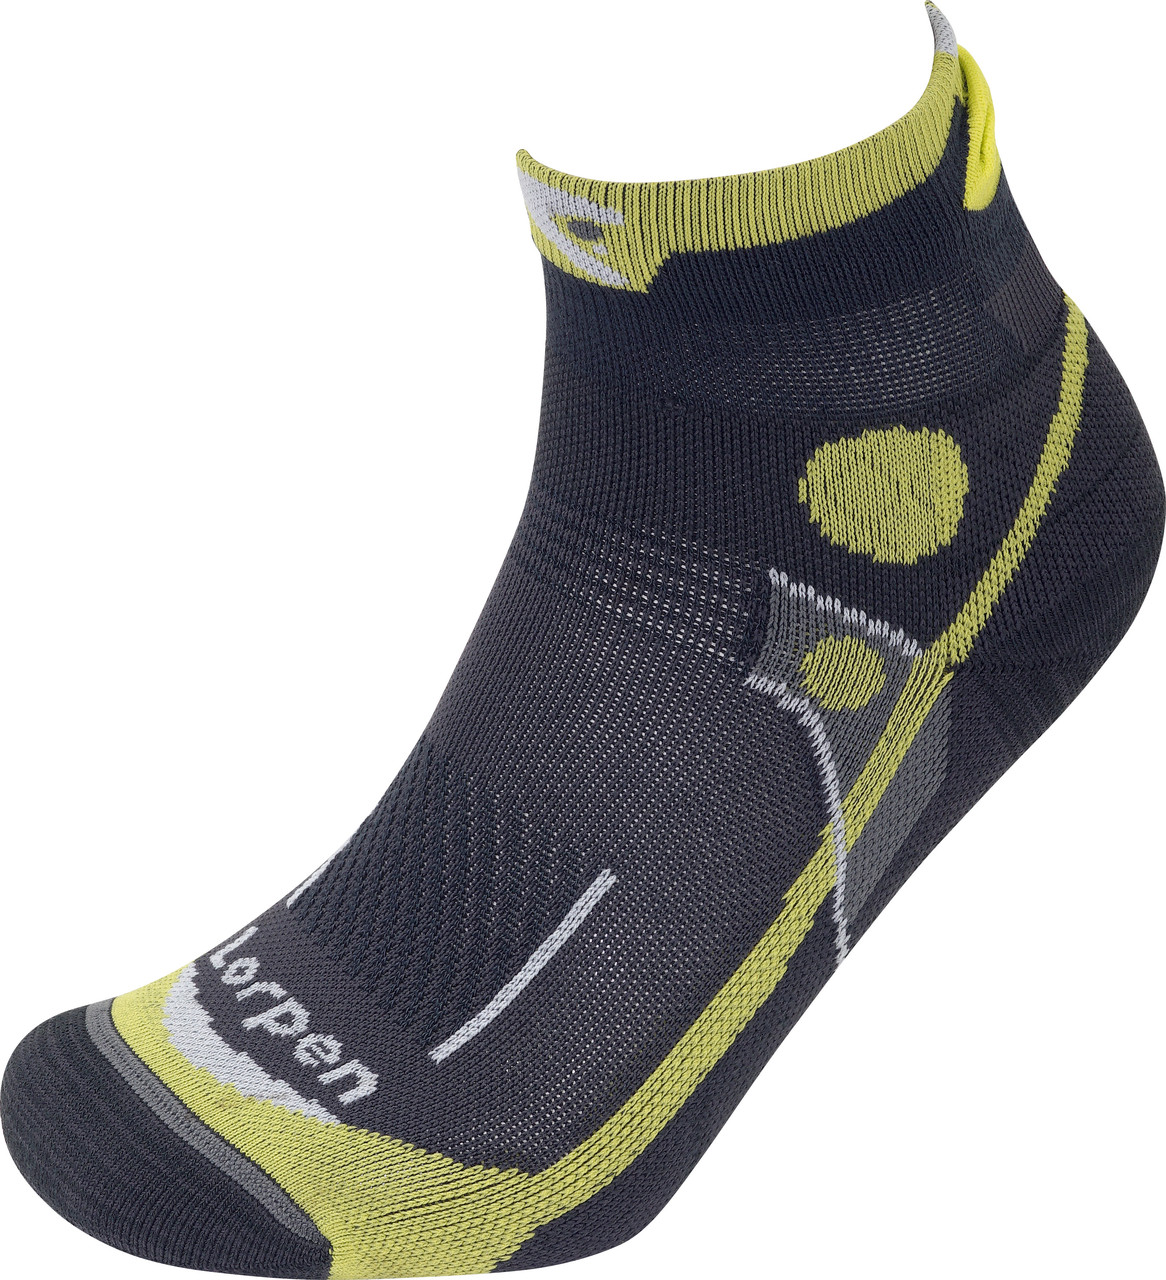 Носки Lorpen T3 Men's Ultra Trail Running Padded X3UTP17 Green Lime M (6210085 5448 M)